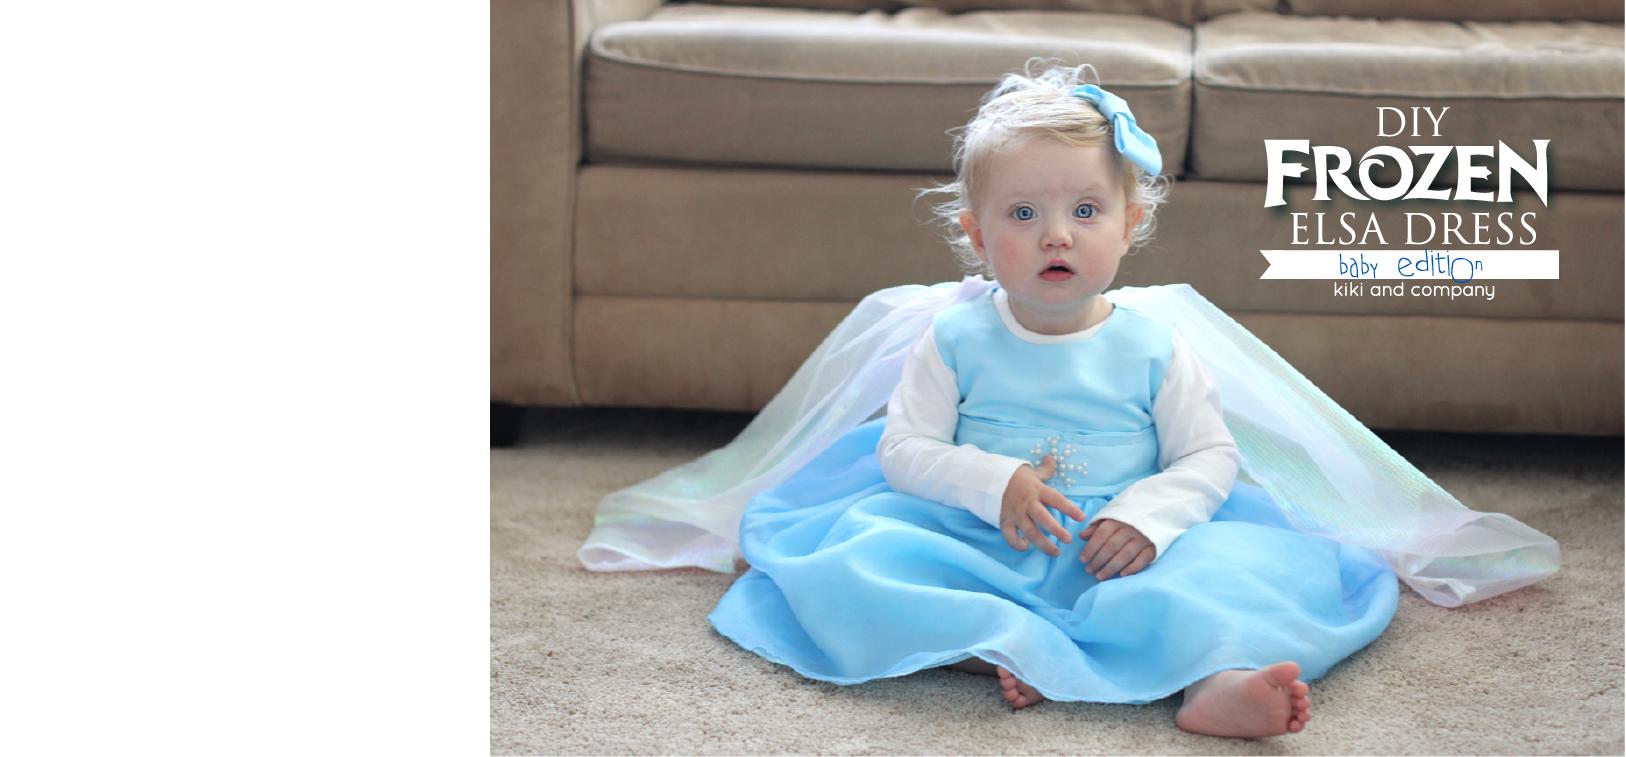 Where can i buy a frozen elsa dress